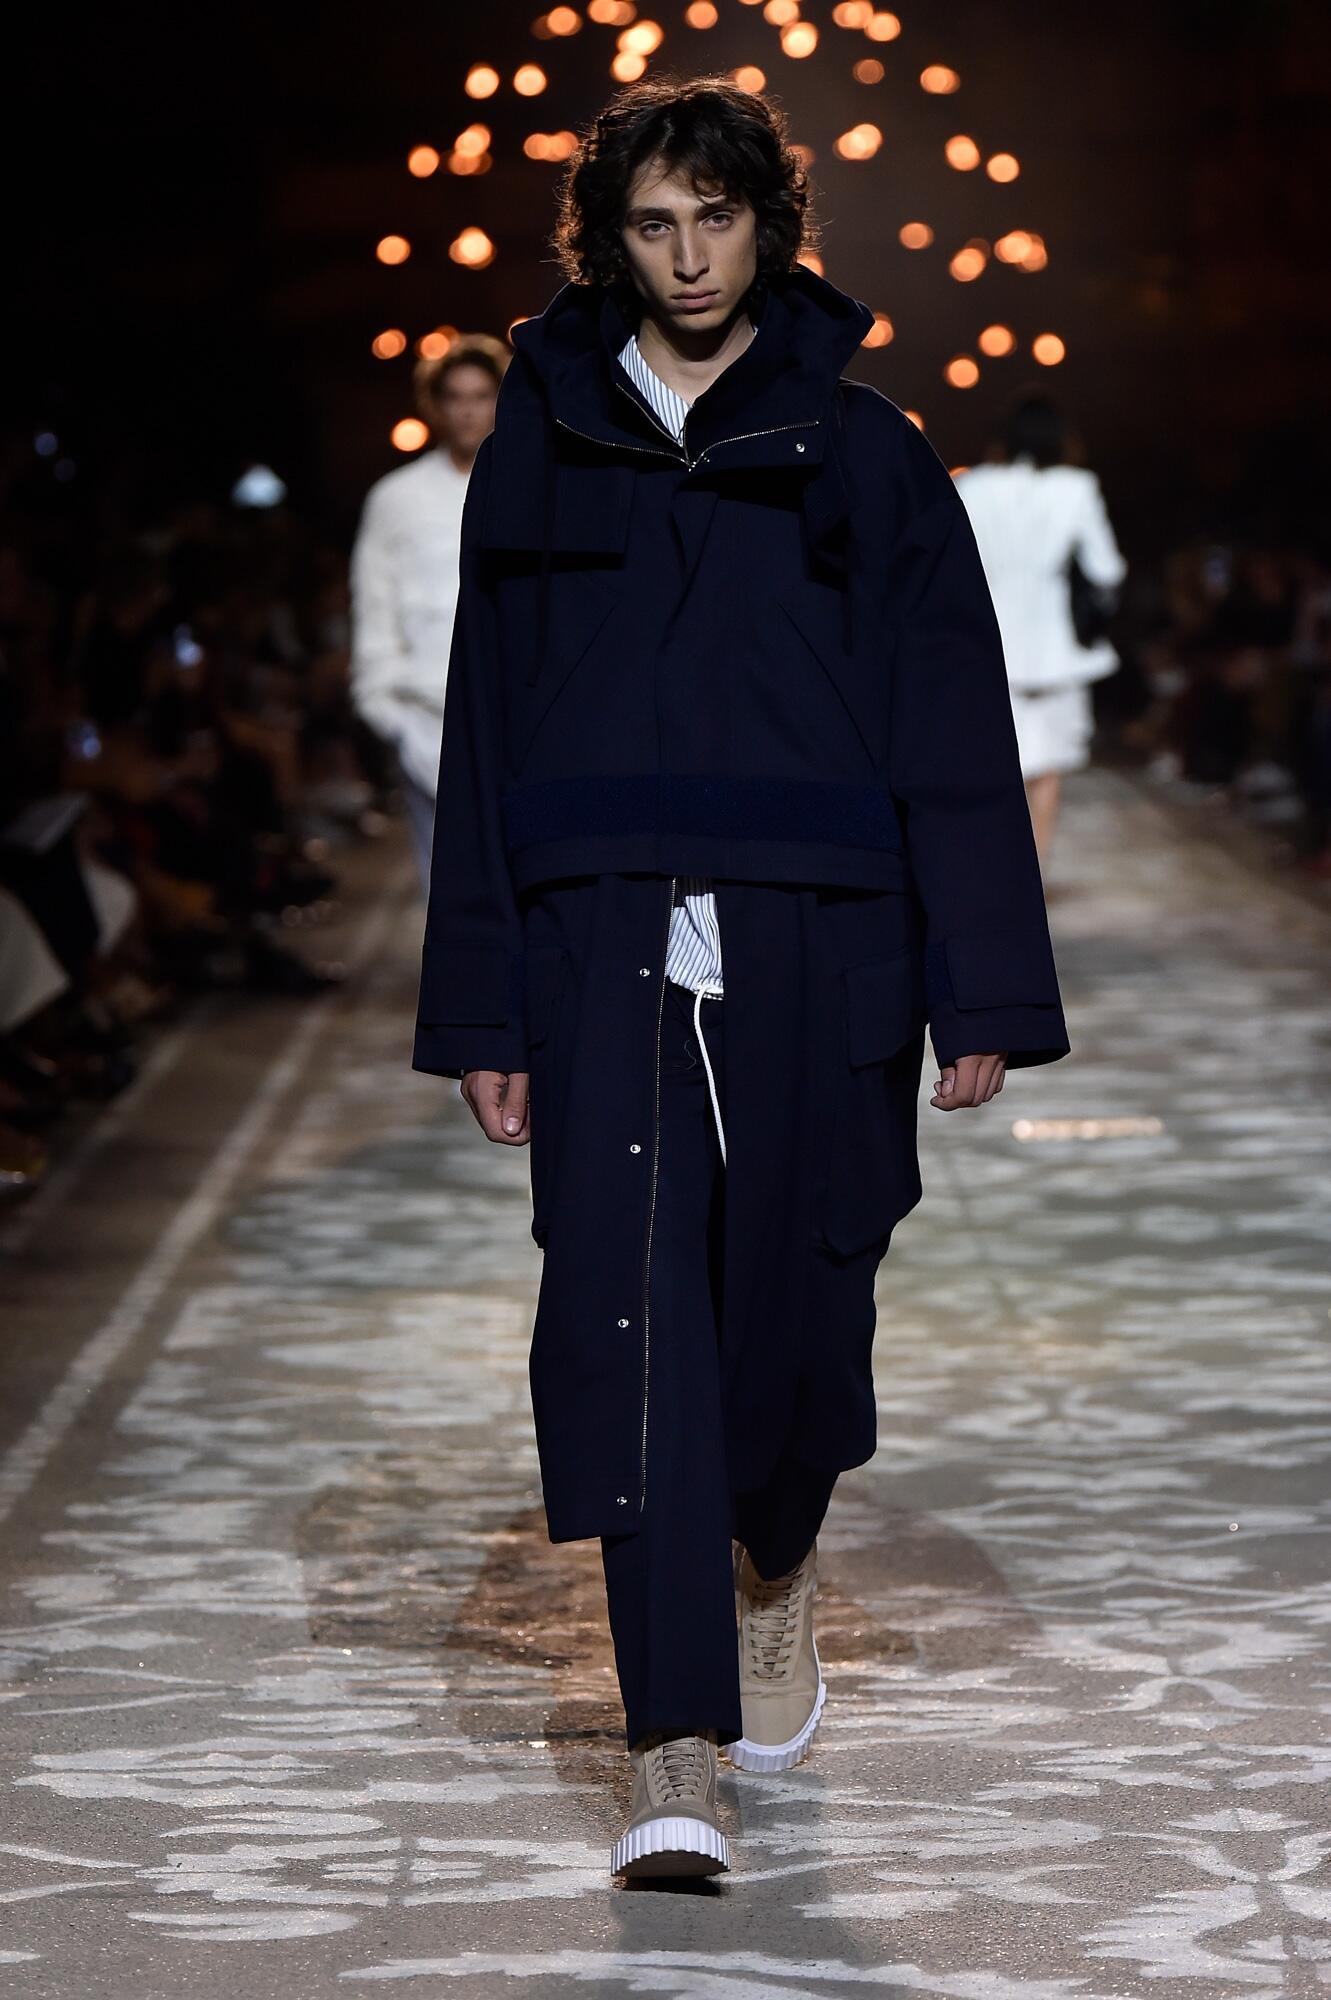 Hugo Mens Fashion Show